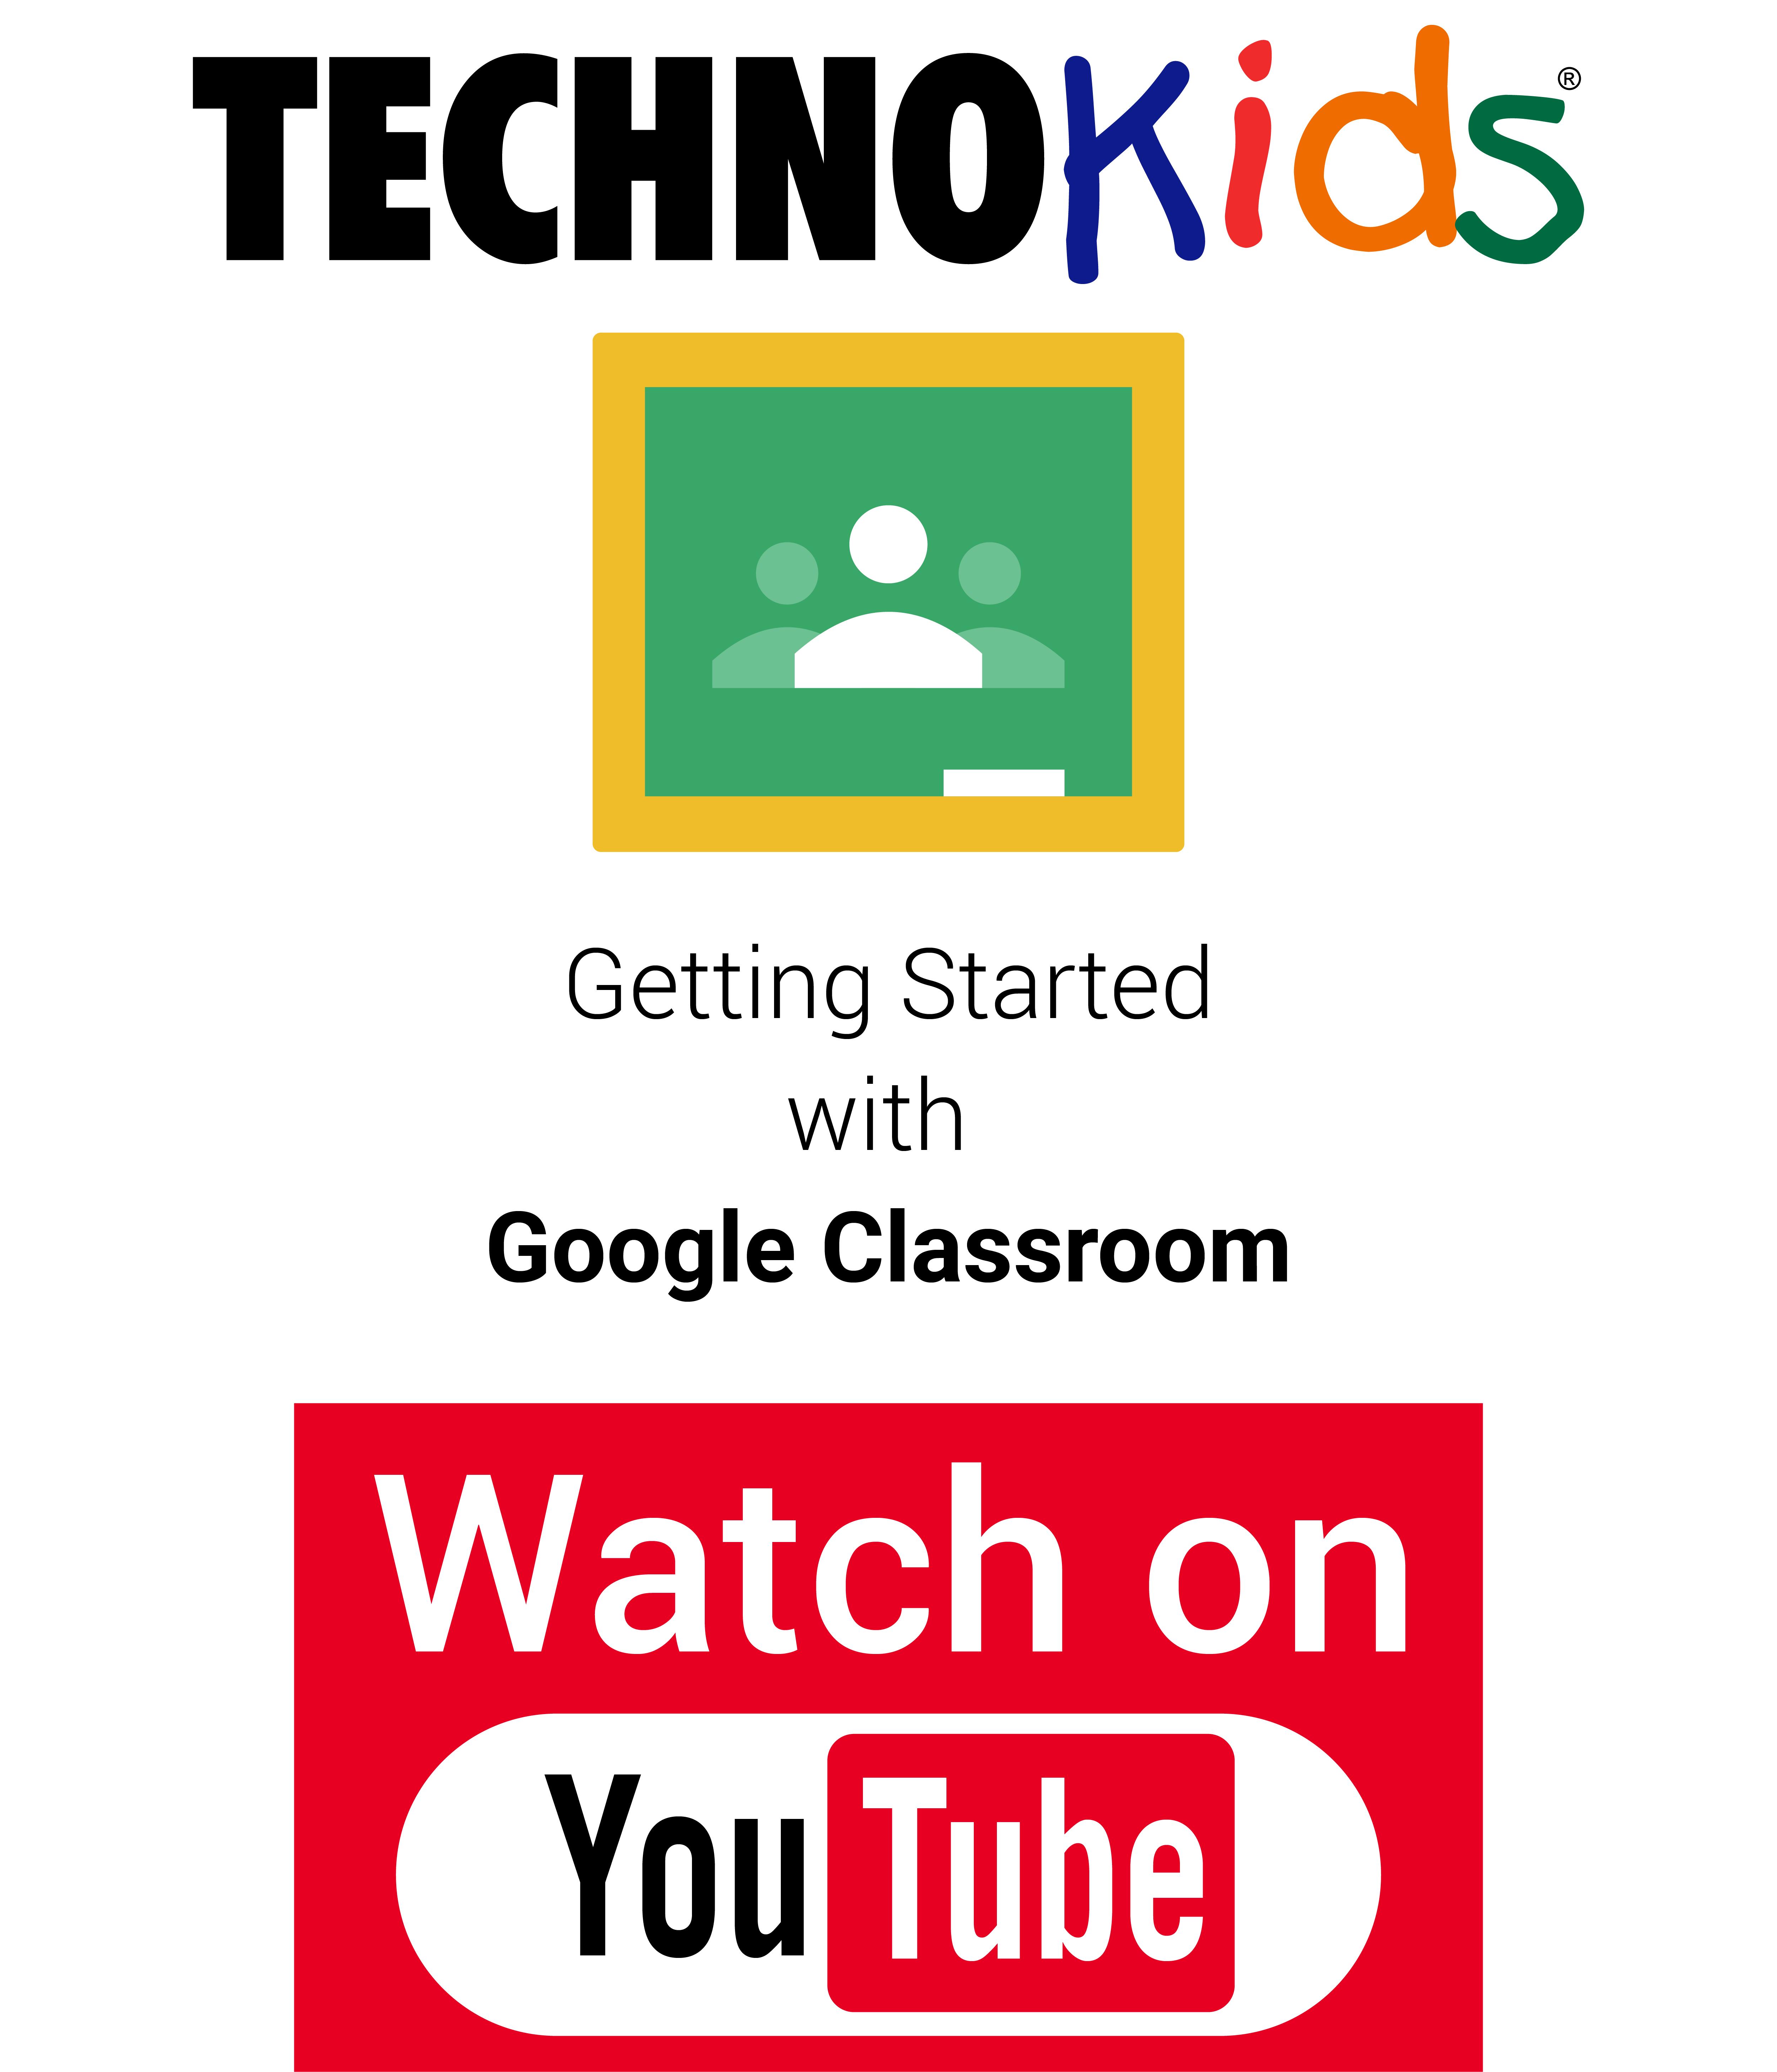 Get Ready To Teach Technokids Technology Projects Using